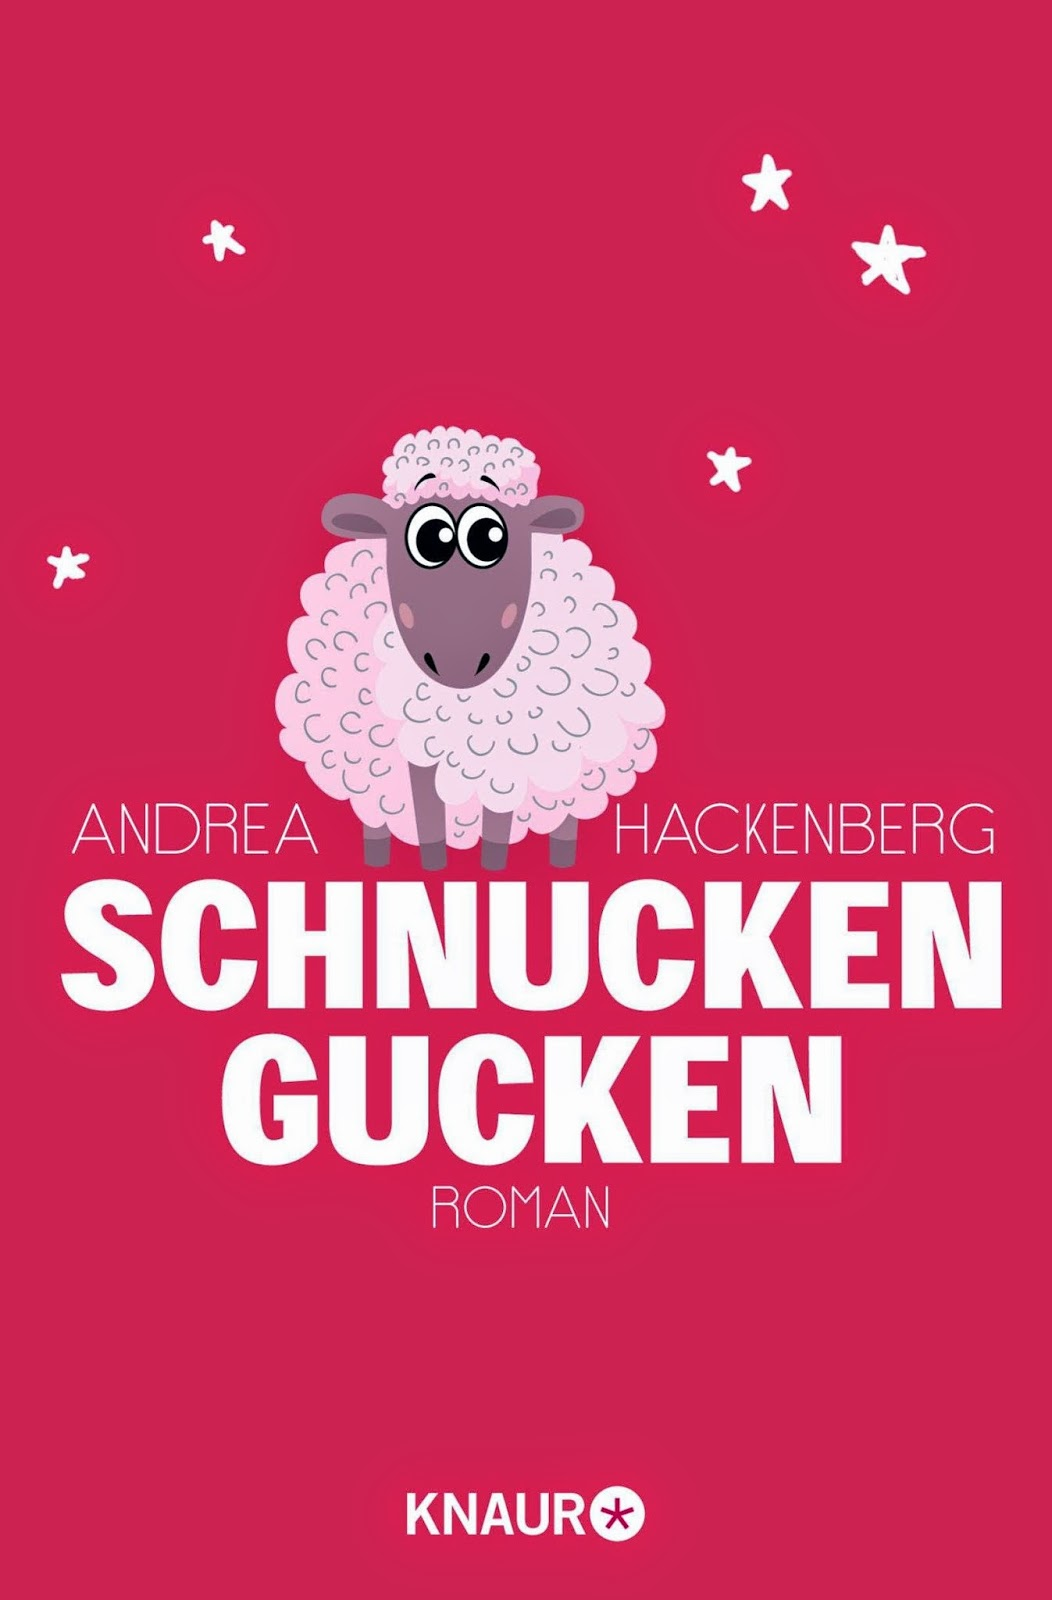 http://www.amazon.de/Schnucken-gucken-Roman-Andrea-Hackenberg/dp/3426514265/ref=sr_1_1_twi_2?ie=UTF8&qid=1422113662&sr=8-1&keywords=schnucken+gucken